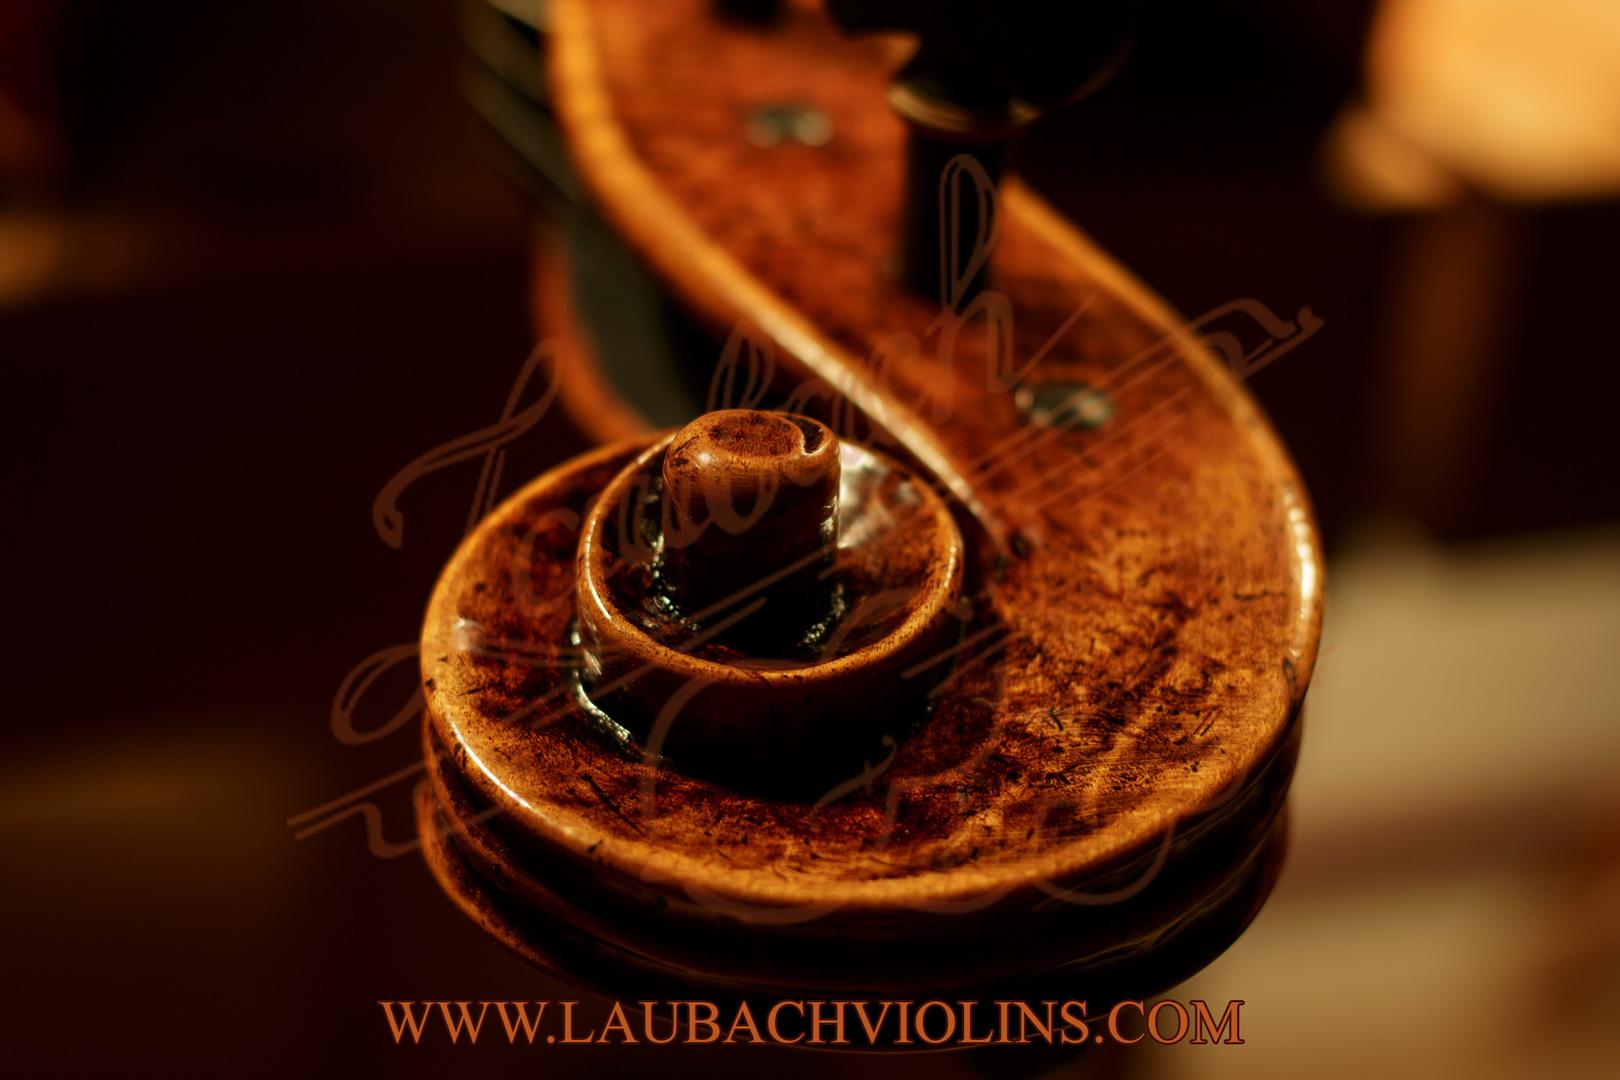 laubach-cello-168-4.jpg